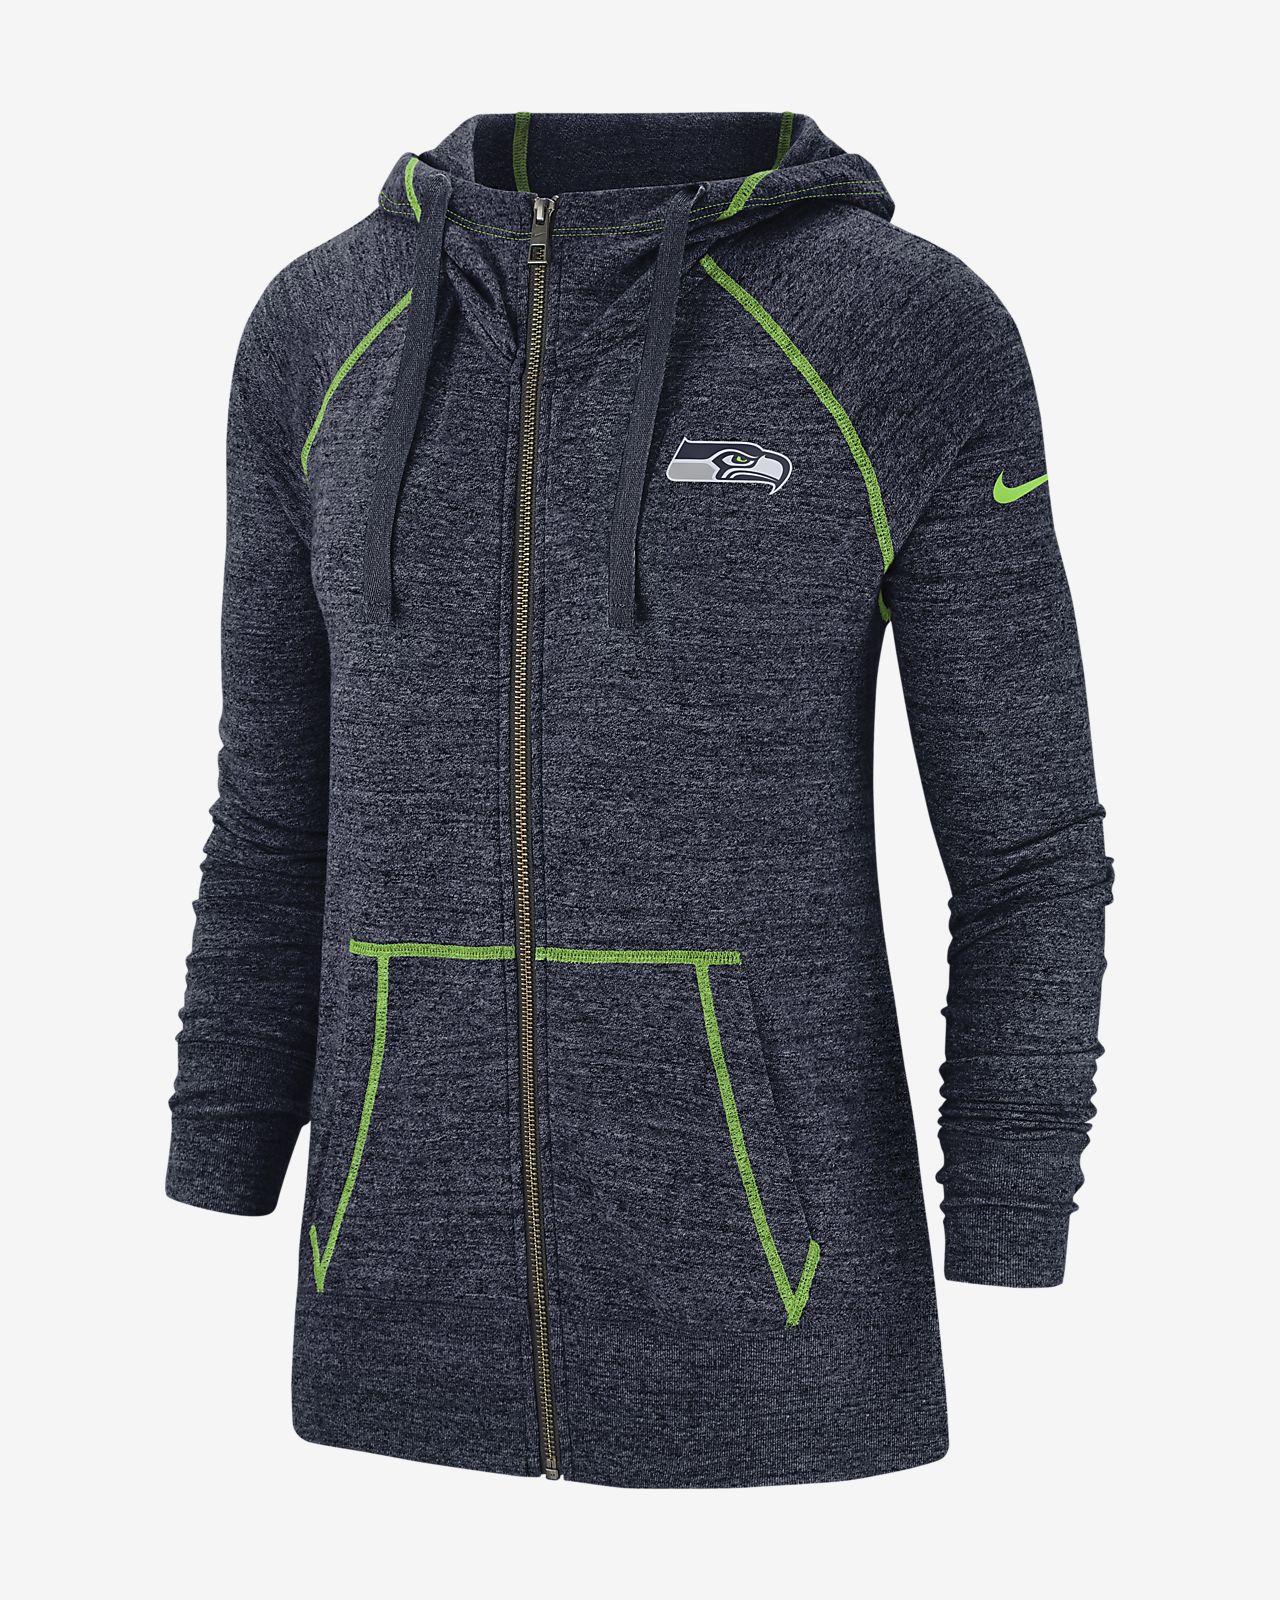 cheaper eb66a a5cec Nike Gym Vintage (NFL Seahawks) Women's Full-Zip Hoodie